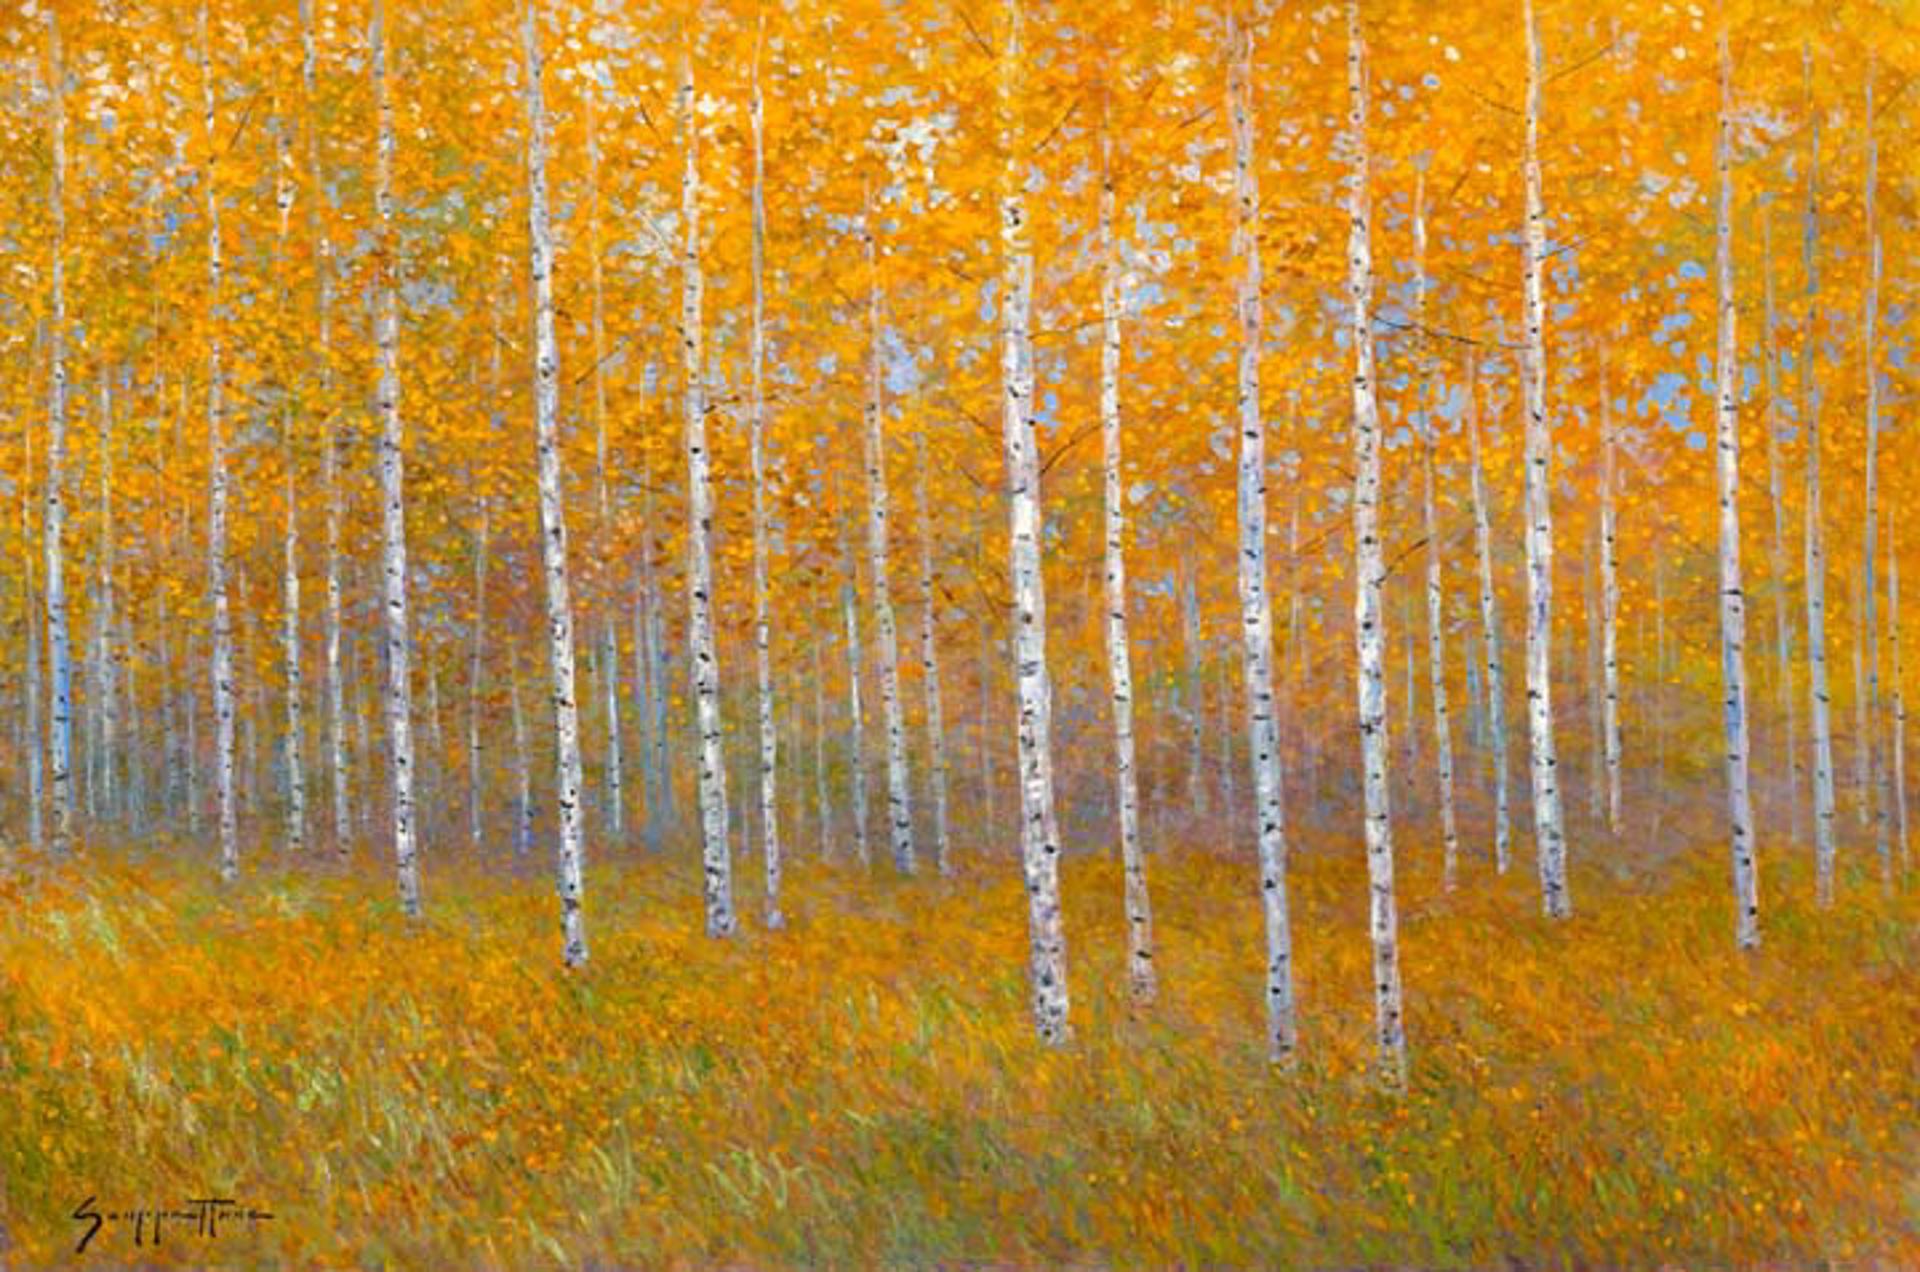 Golden Aspens by James Scoppettone